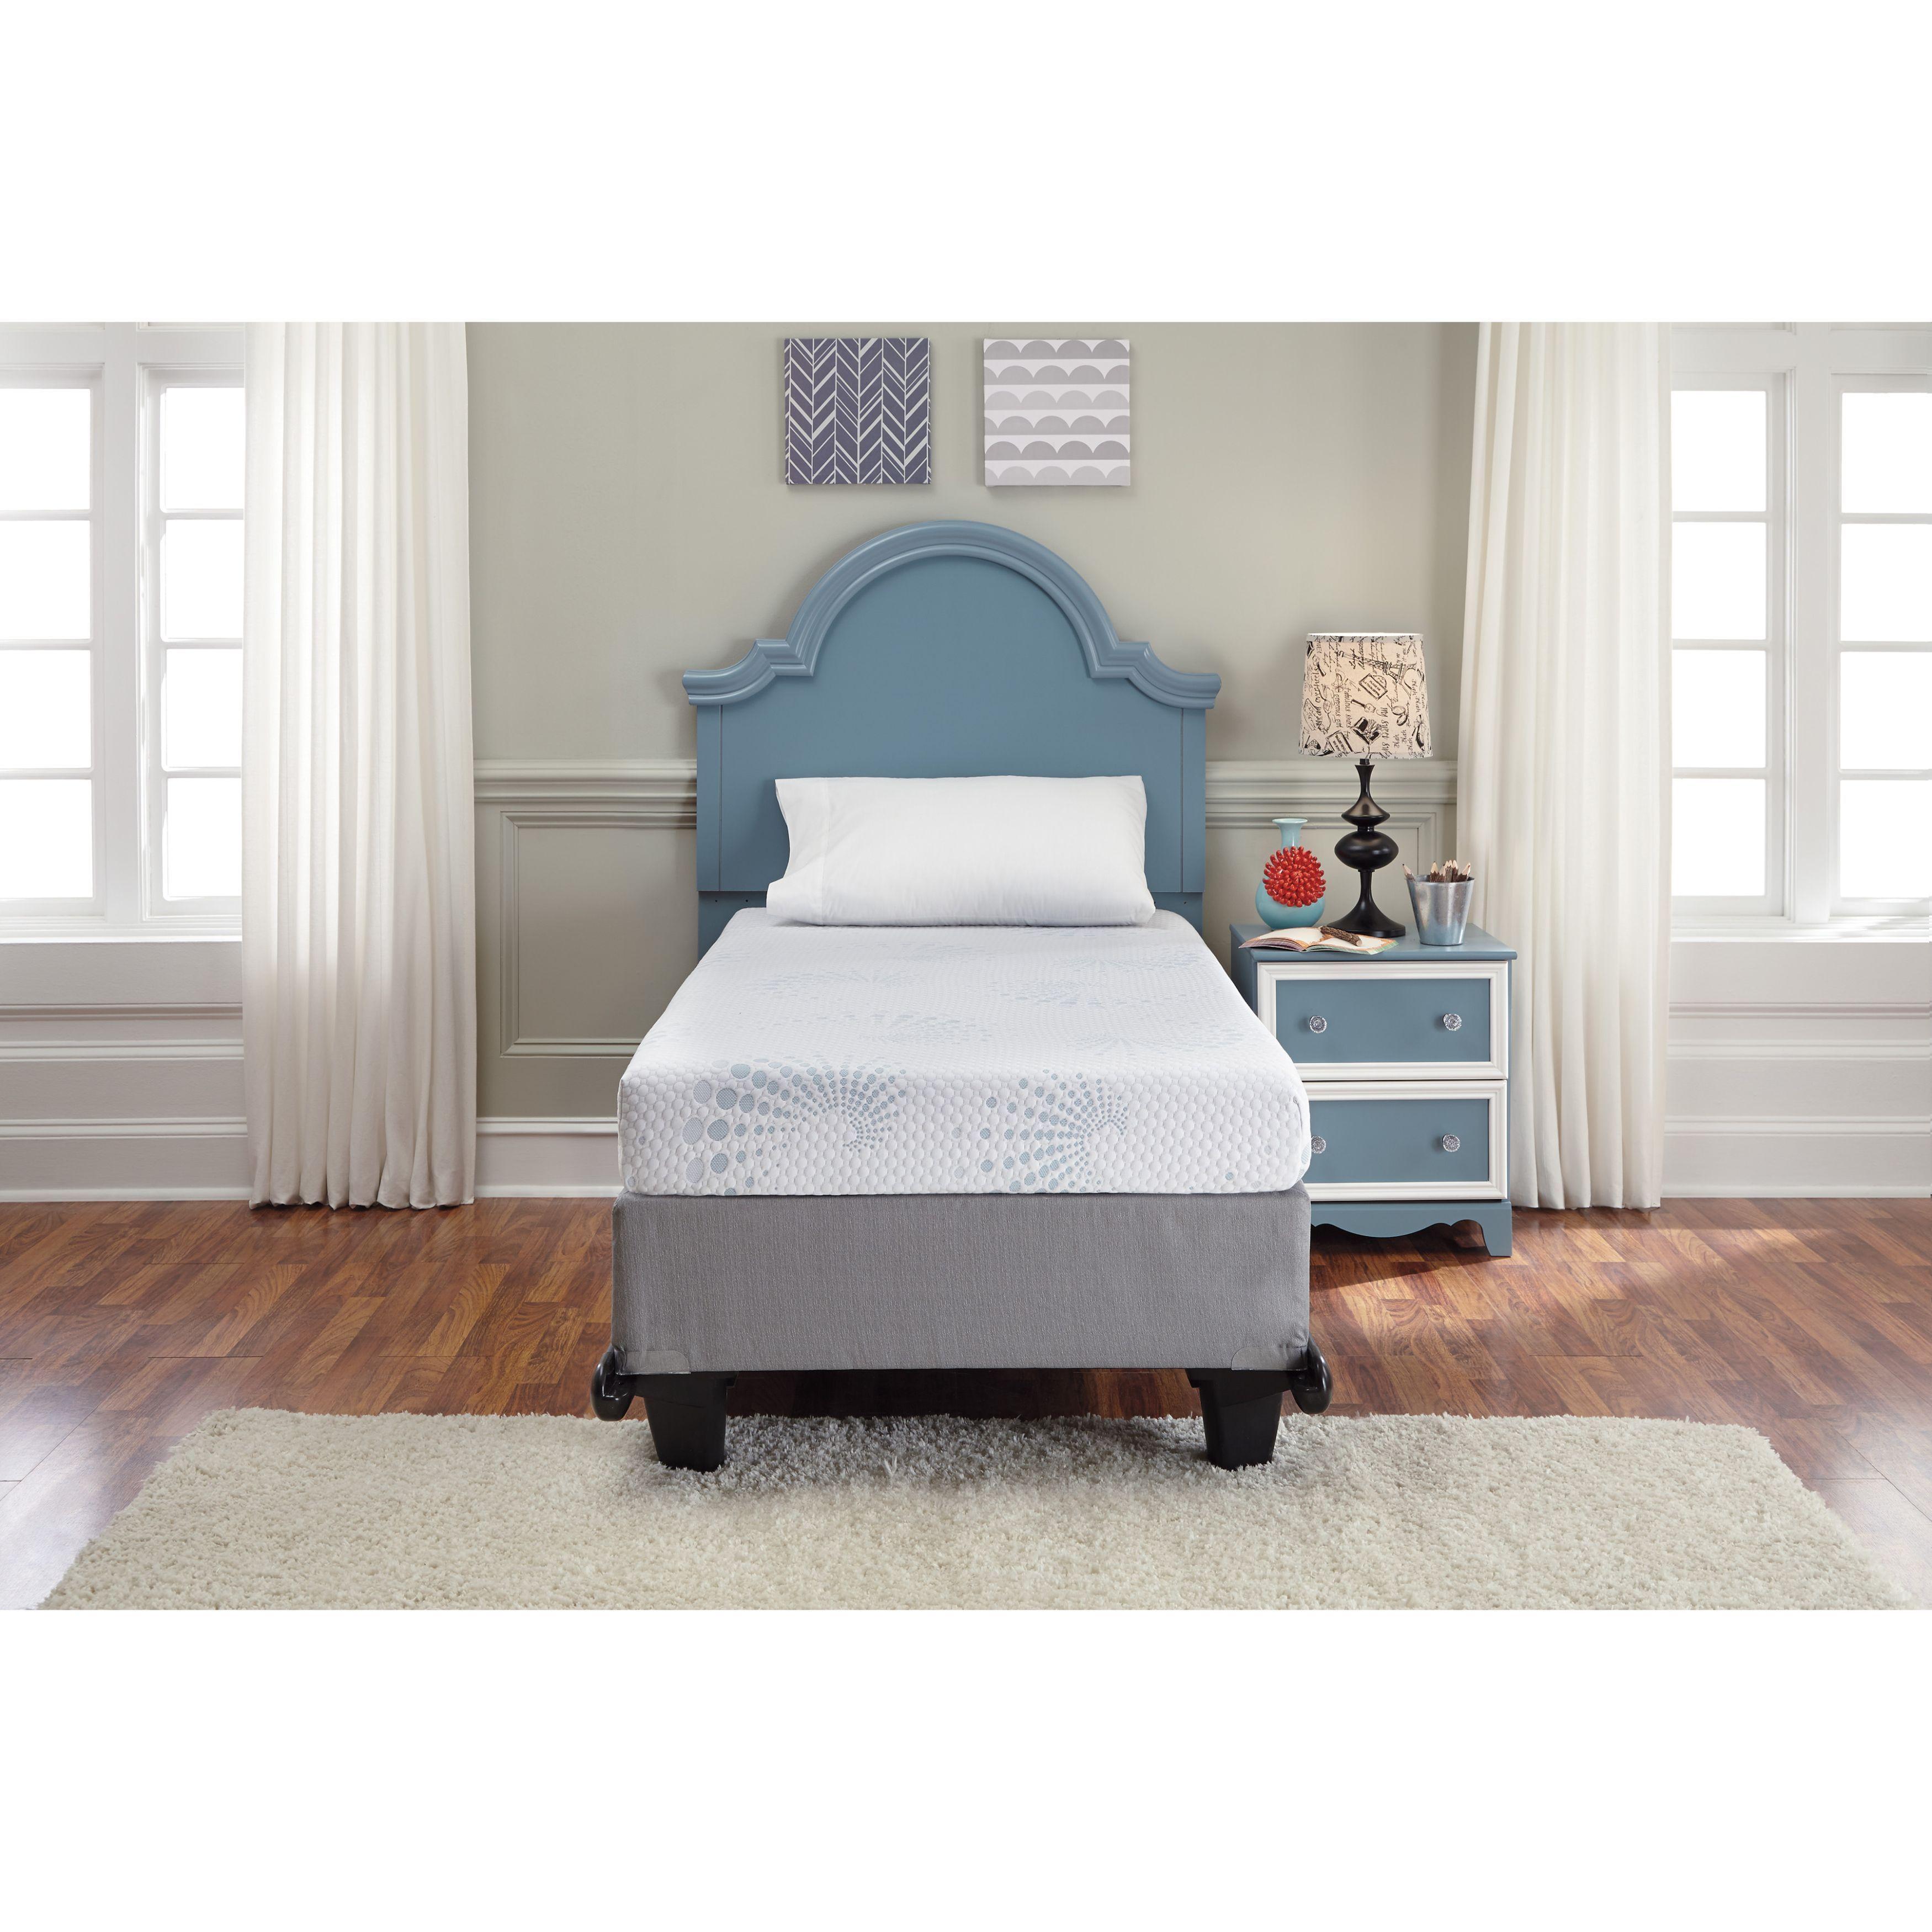 Shop Sierra Sleepashley White 7 Inch Full Size Memory Foam With Sierra Foam Ii Oversized Sofa Chairs (View 24 of 25)